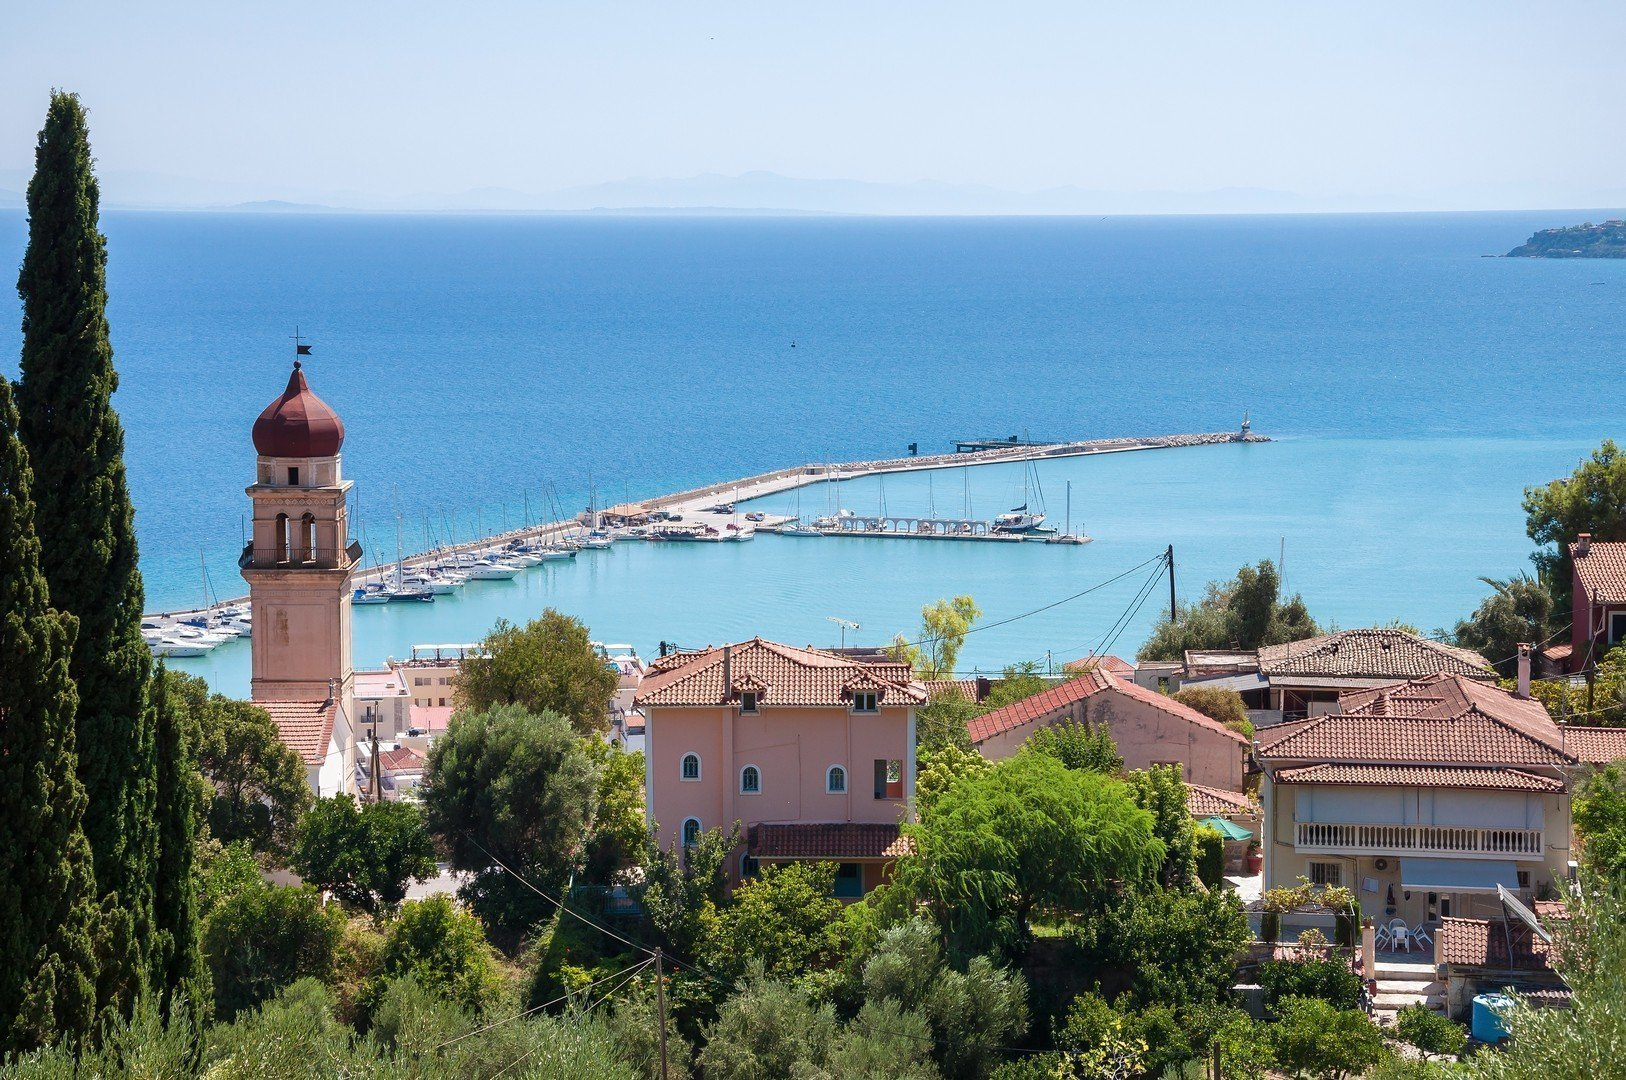 View of port in Zante town, capital city of Zakynhtos, Greece shutterstock_382973059